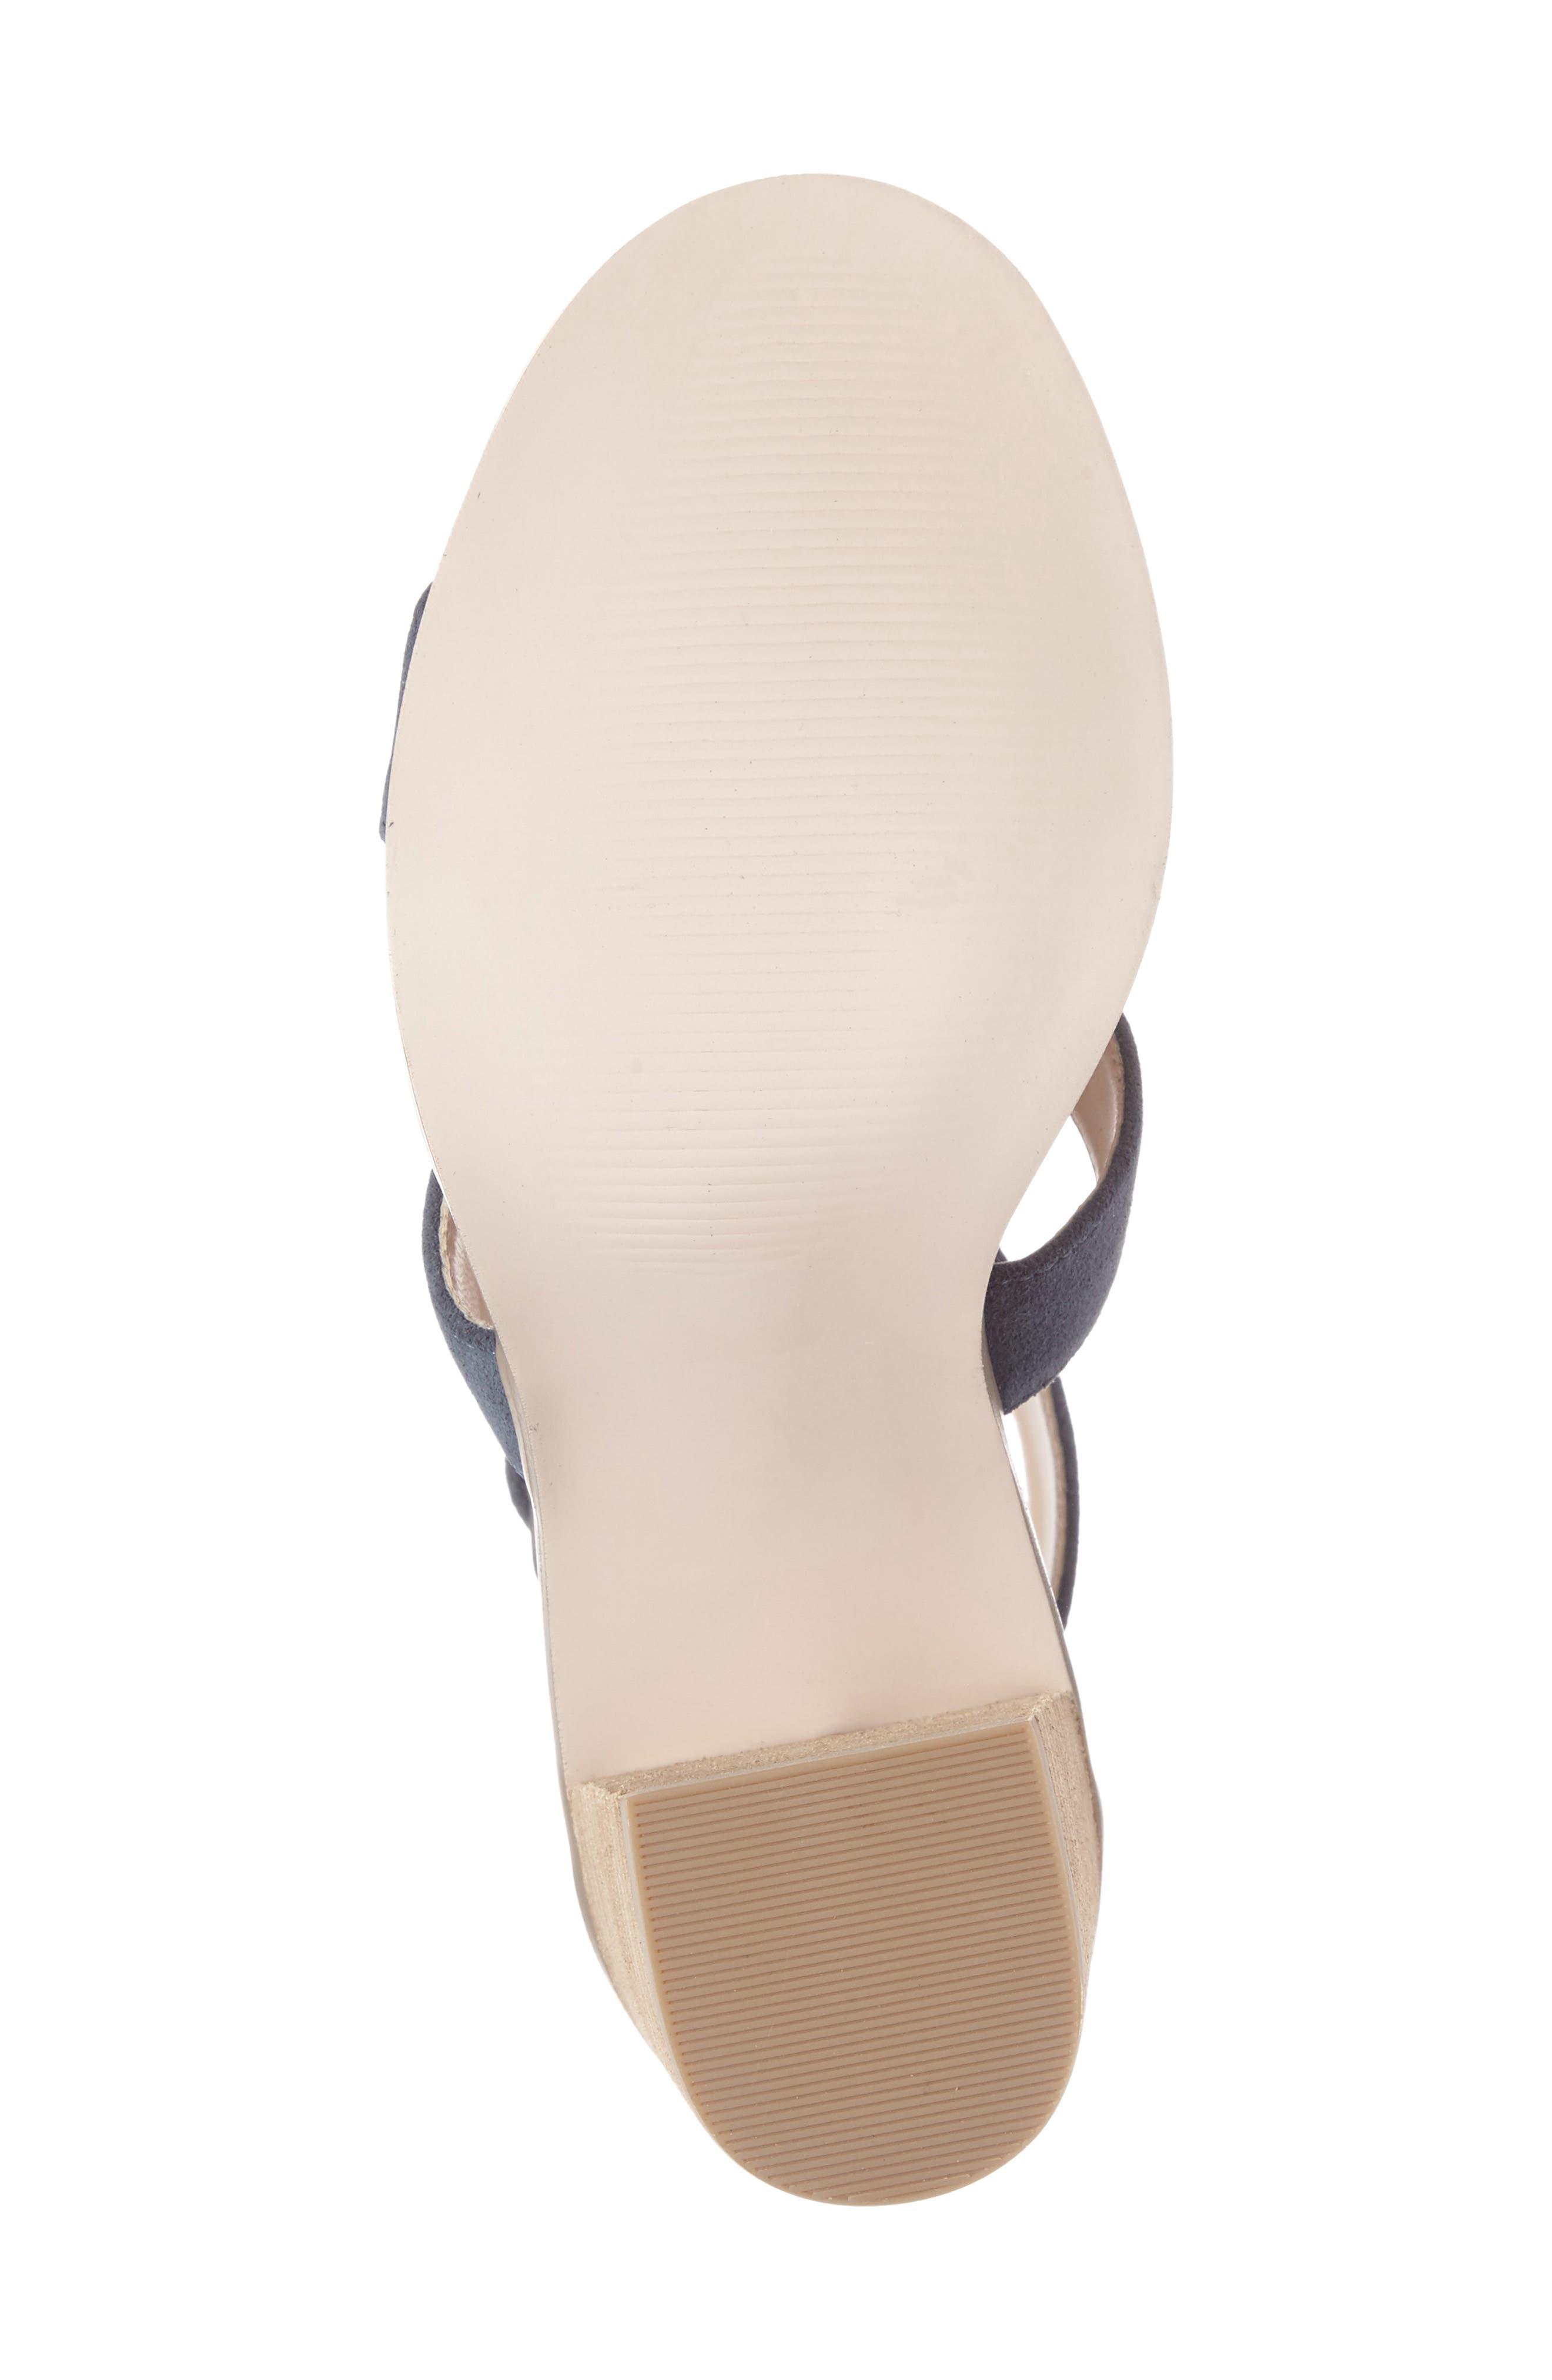 'Delilah' Fringe Sandal,                             Alternate thumbnail 4, color,                             Vista Blue